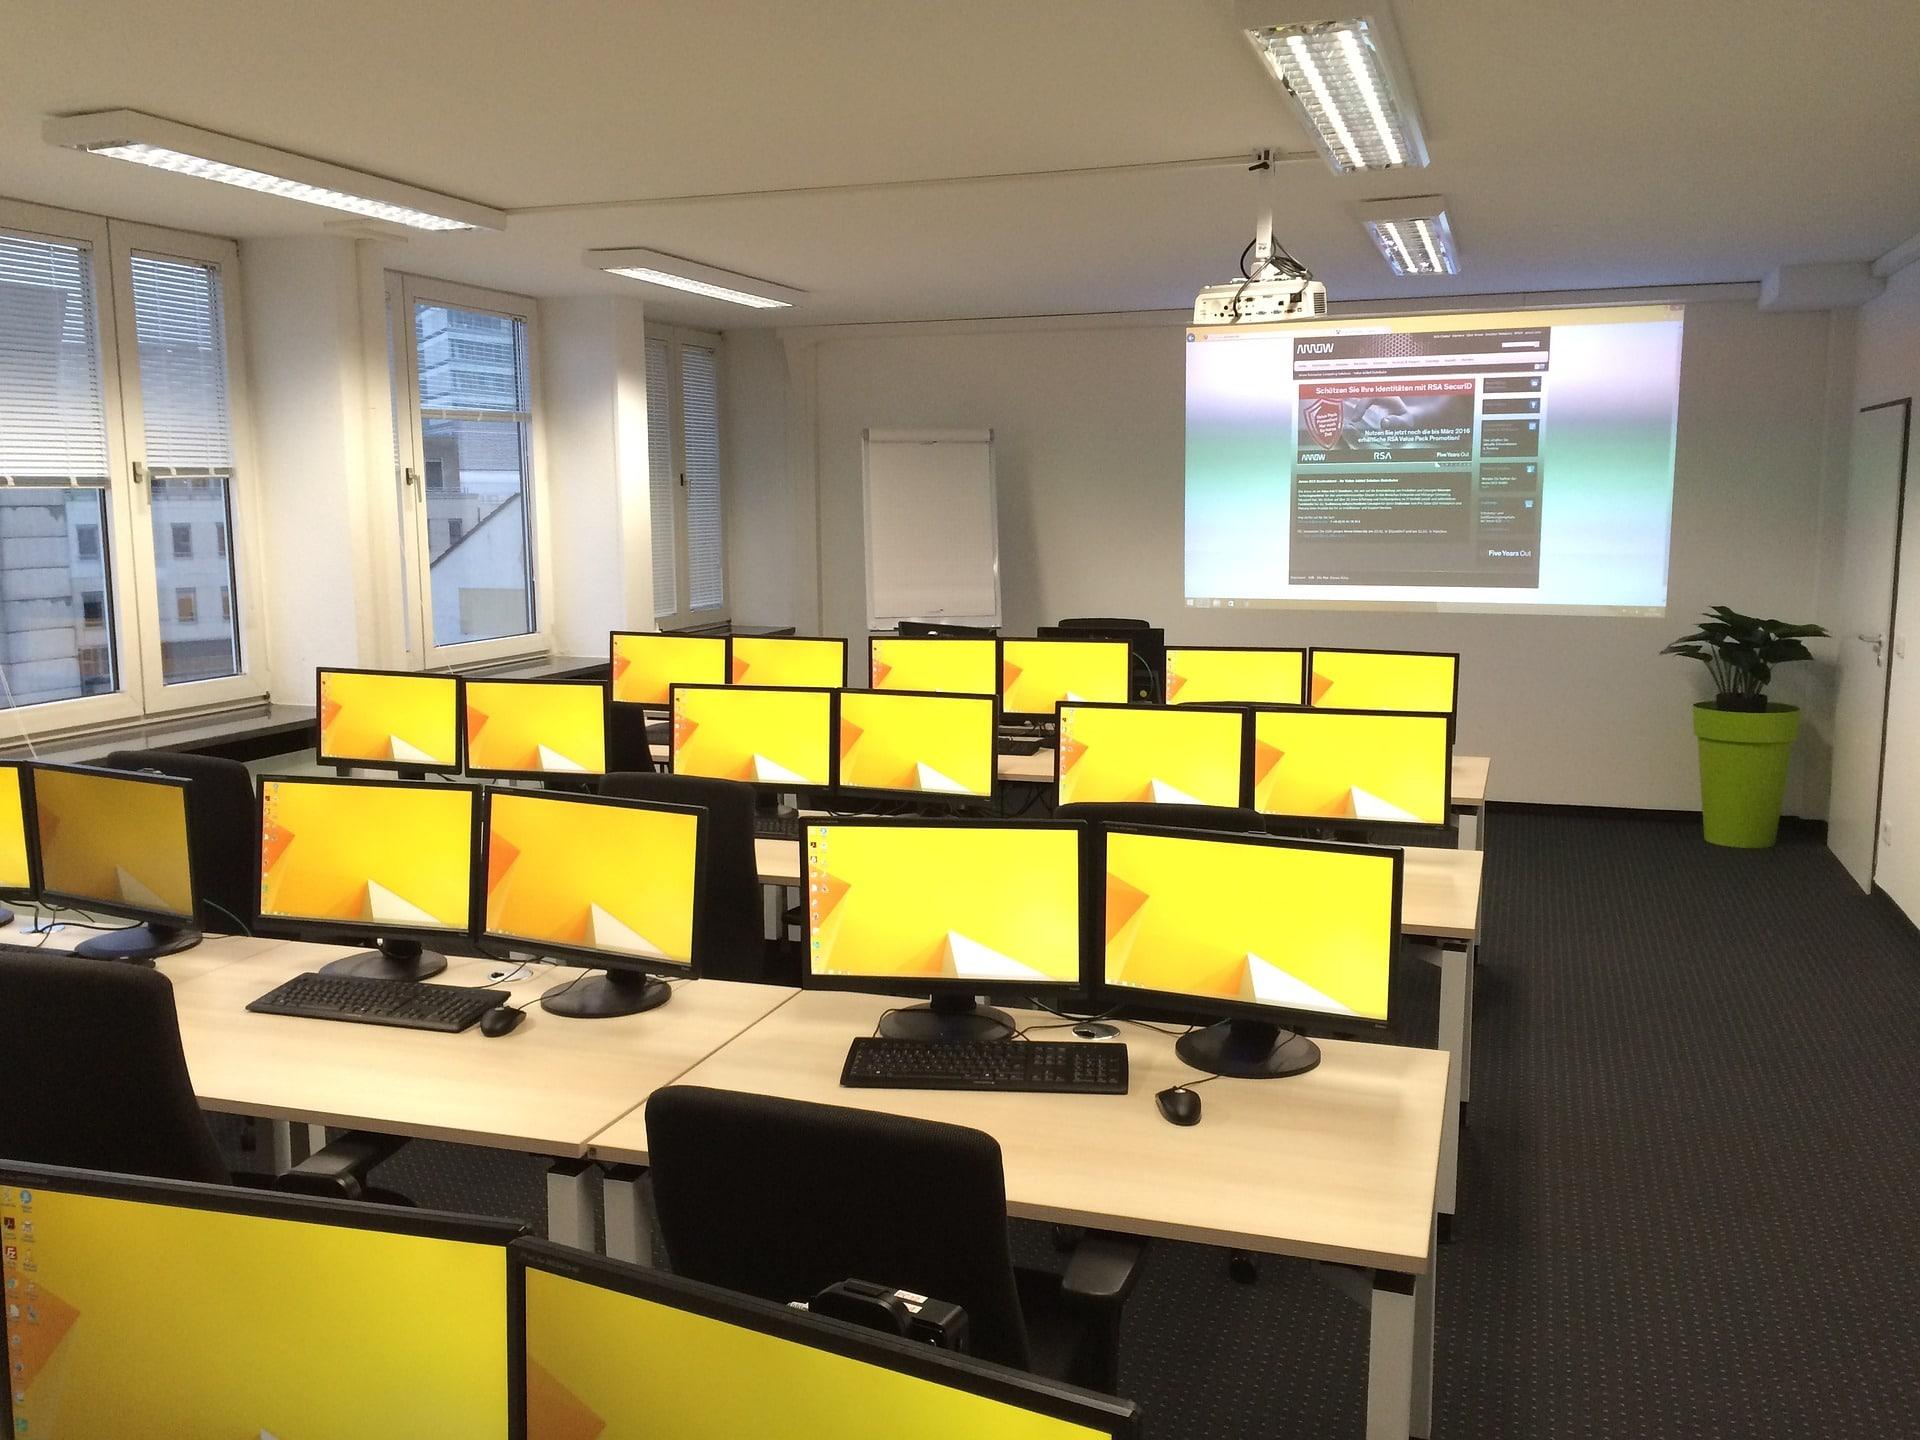 classroom-1167525_1920